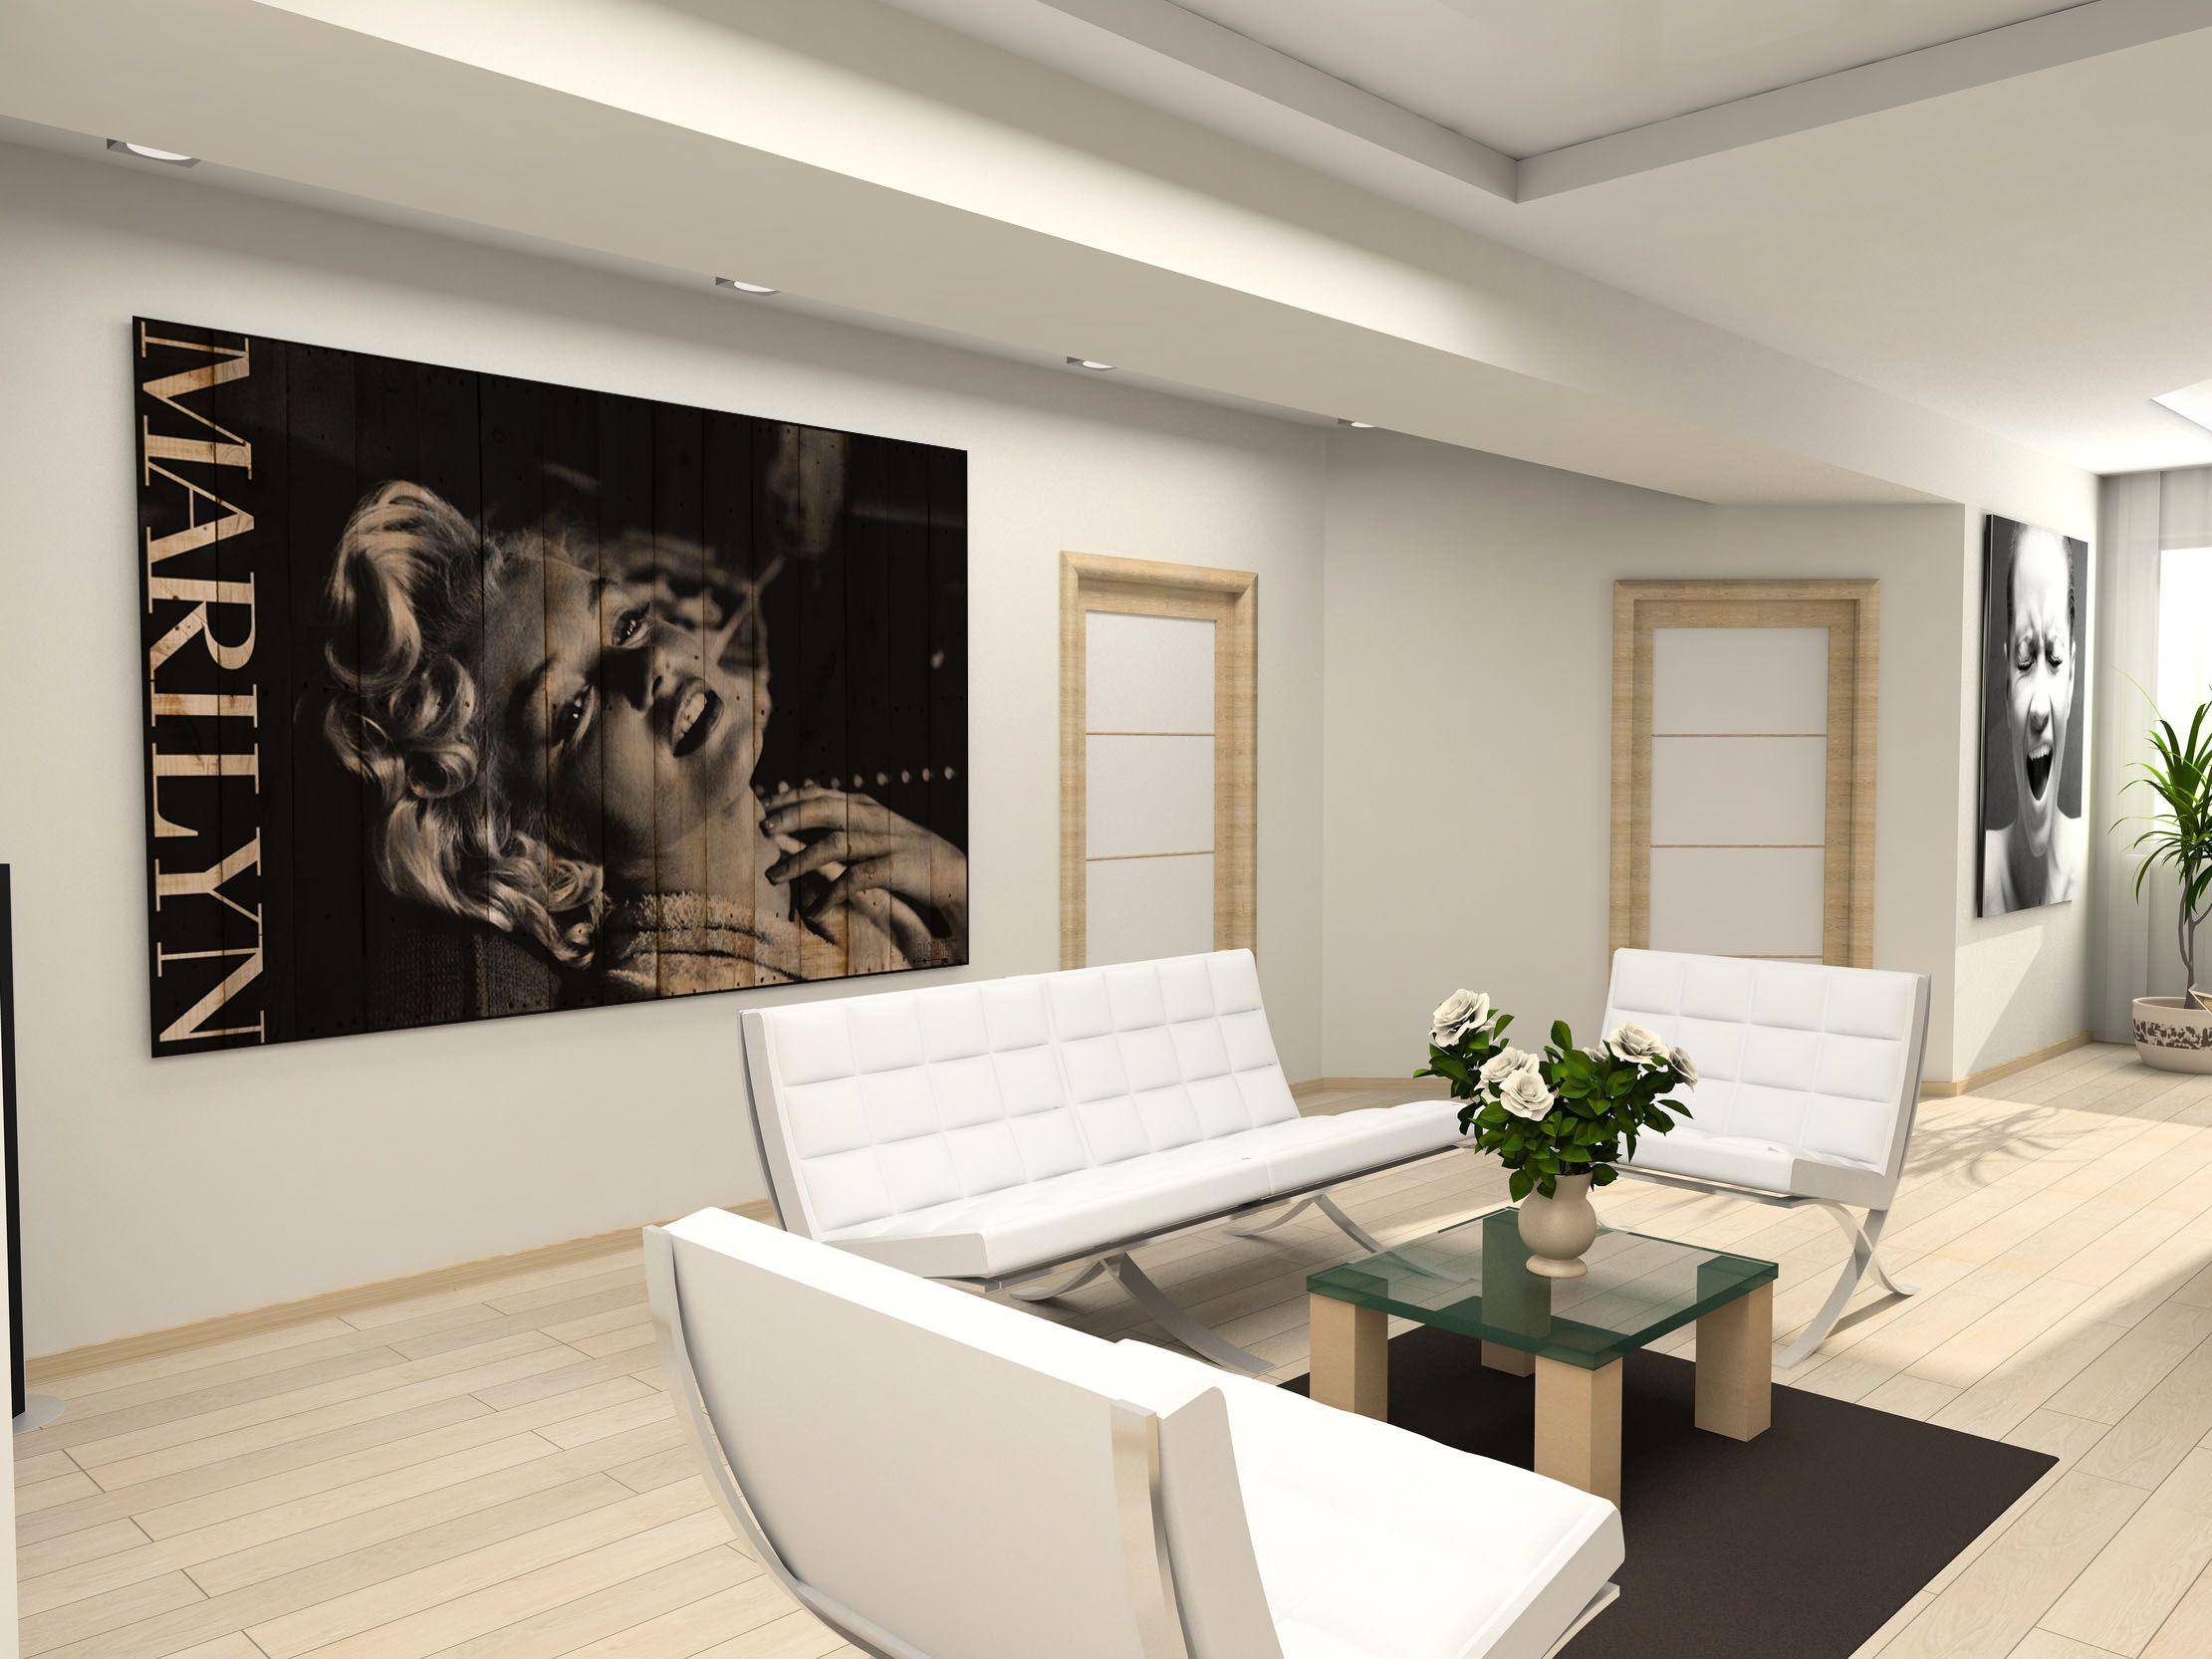 Moderno Decoración Interiores Online Ideas - Ideas de Decoración de ...